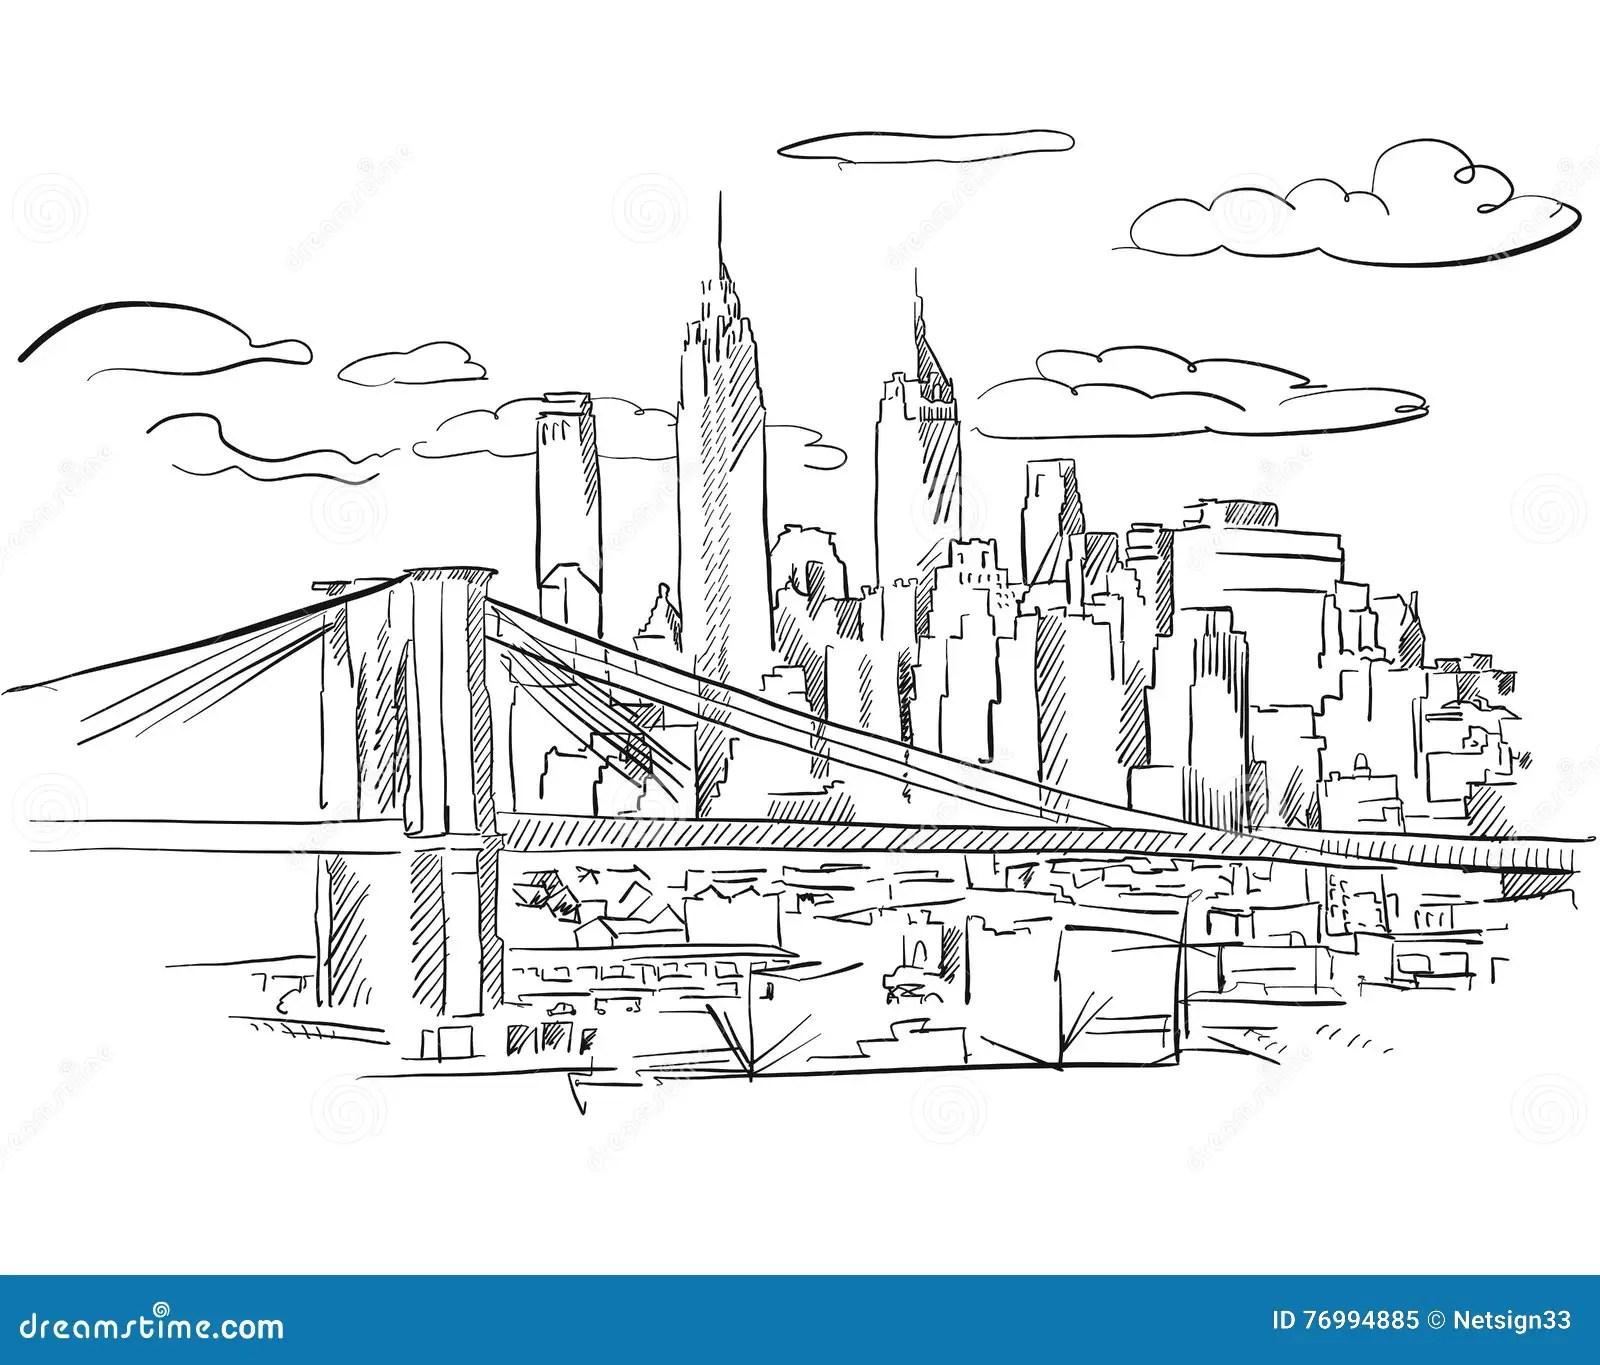 Manhattan And Brooklyn Bridge Detailed Sketch Stock Vector